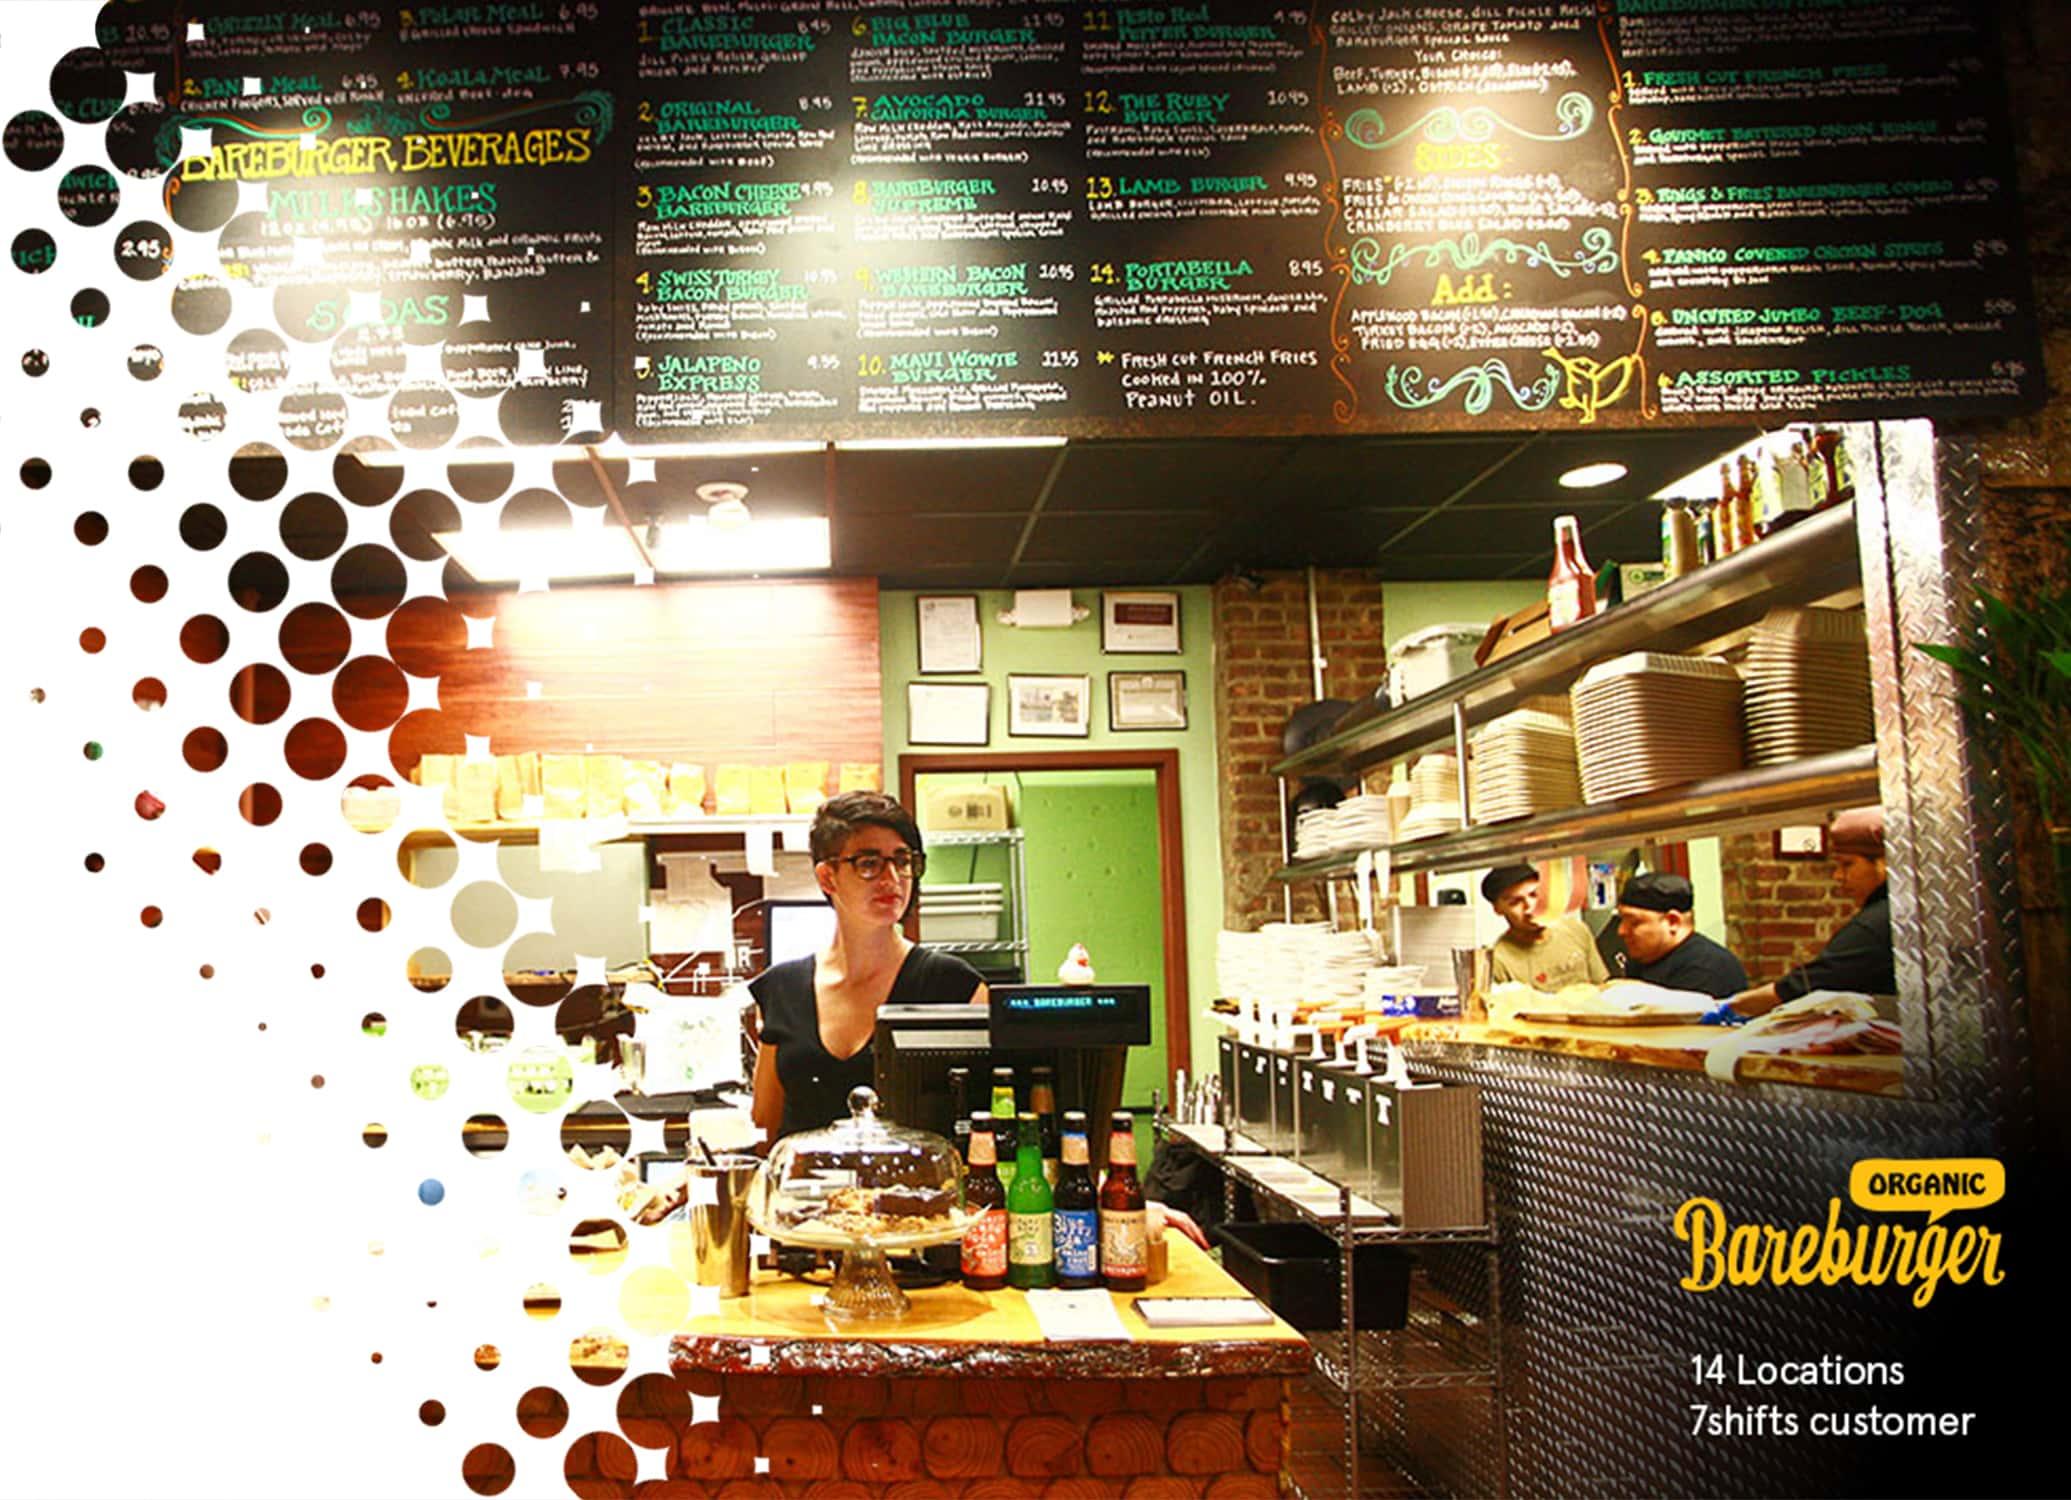 Bareburger a 14 location 7shifts client restaurant image